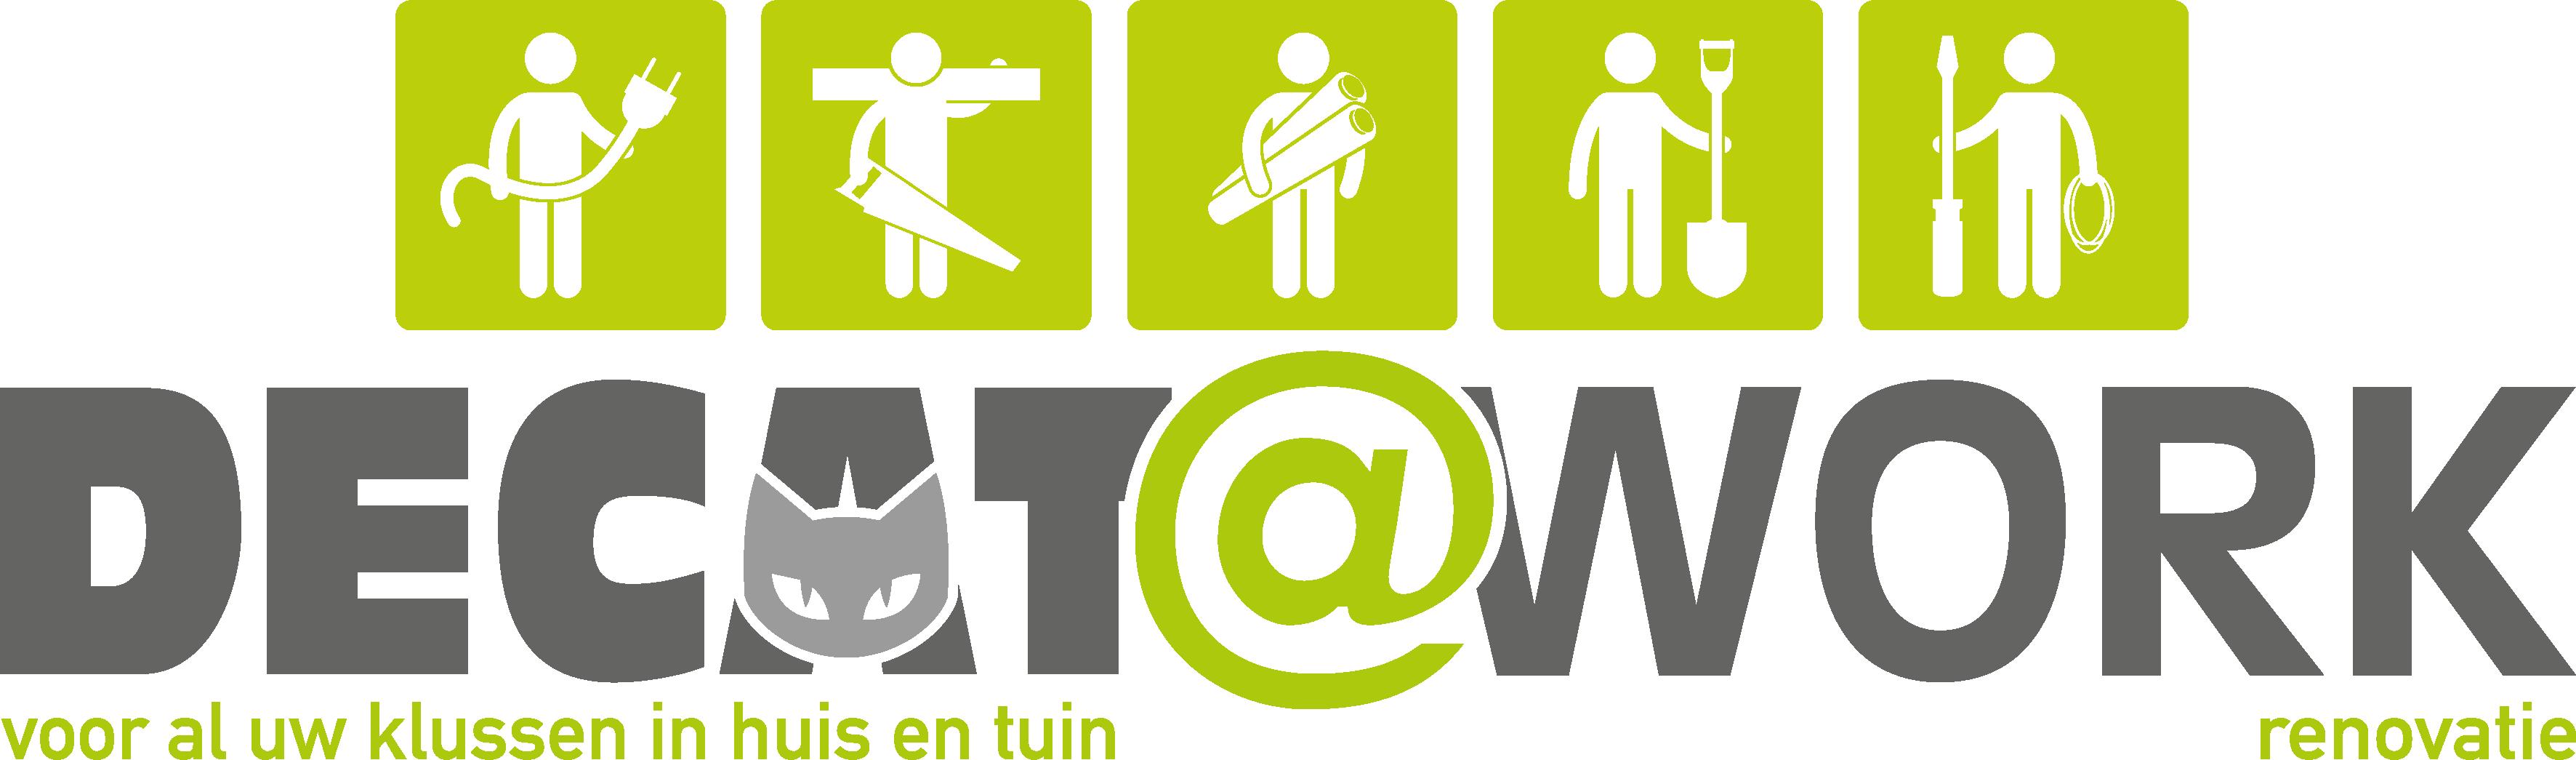 Logo klussendecat